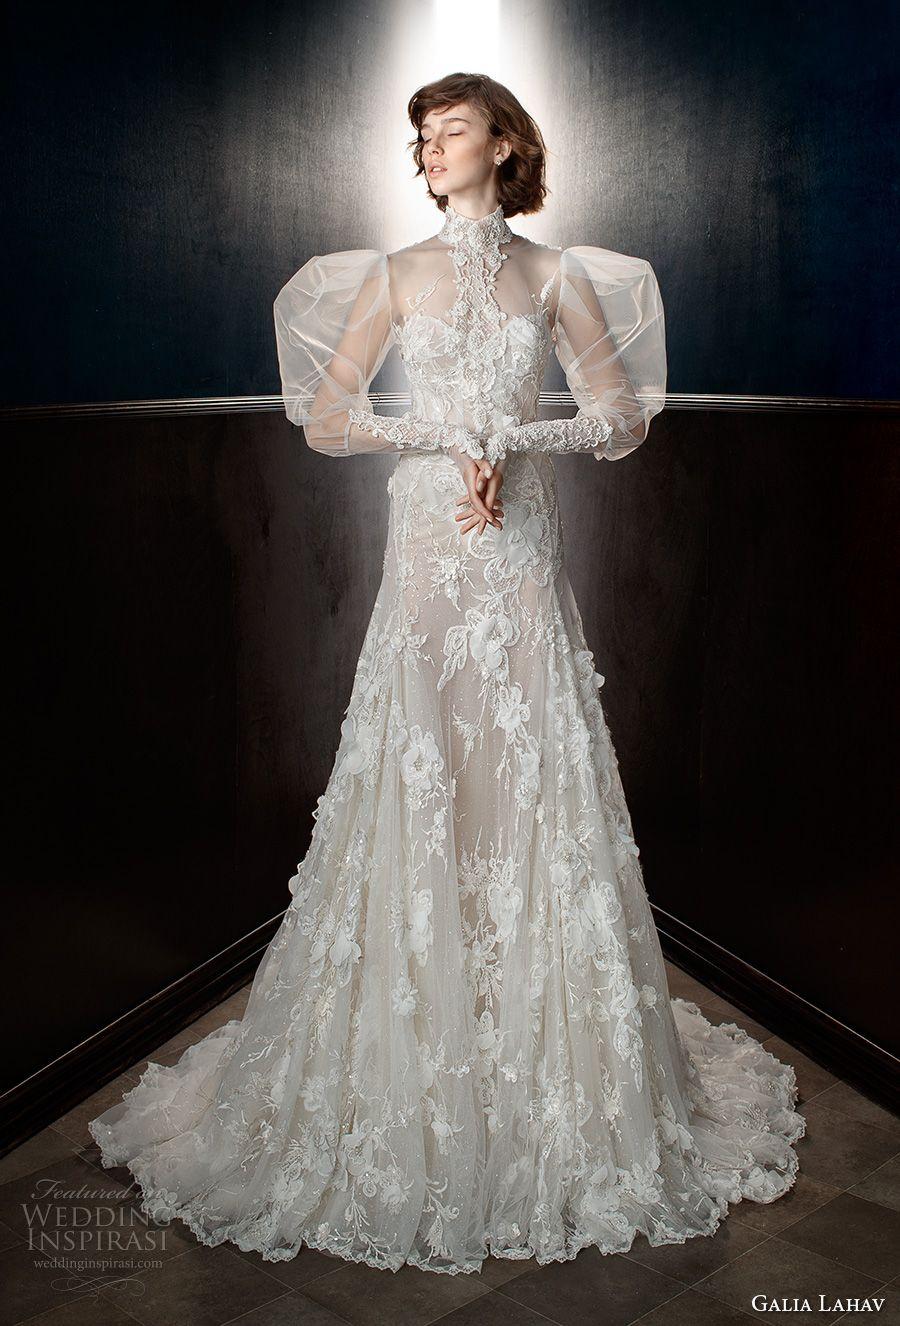 Galia Lahav Spring 2018 Wedding Dresses Victorian Affinity Bridal Collection Wedding Inspirasi Victorian Wedding Dress Sheer Wedding Dress Wedding Dress Trends [ 1326 x 900 Pixel ]